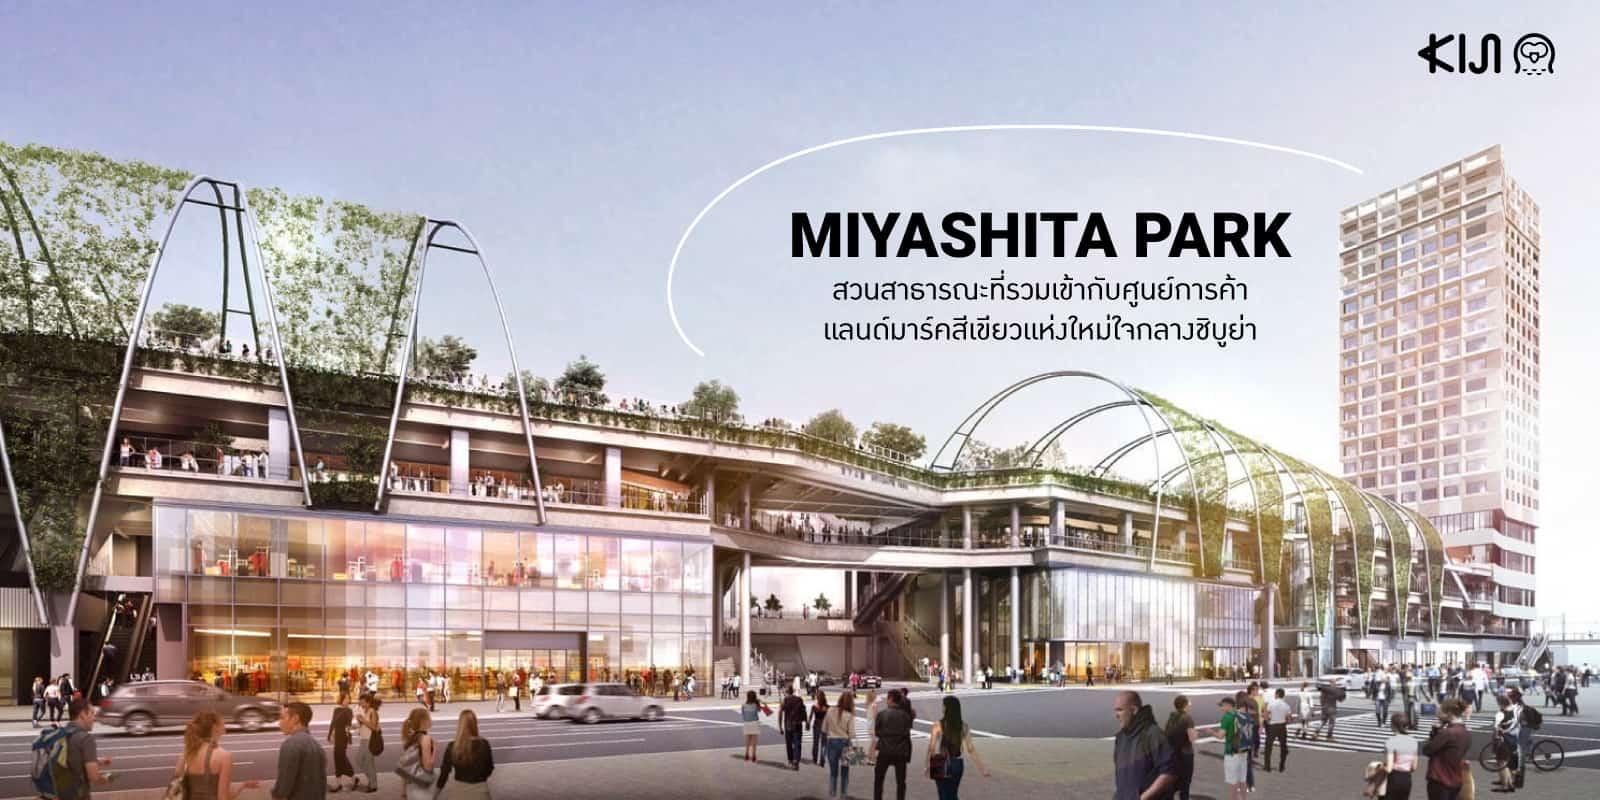 MIYASHITA PARK ที่เที่ยวโตเกียว ย่านชิบูย่า